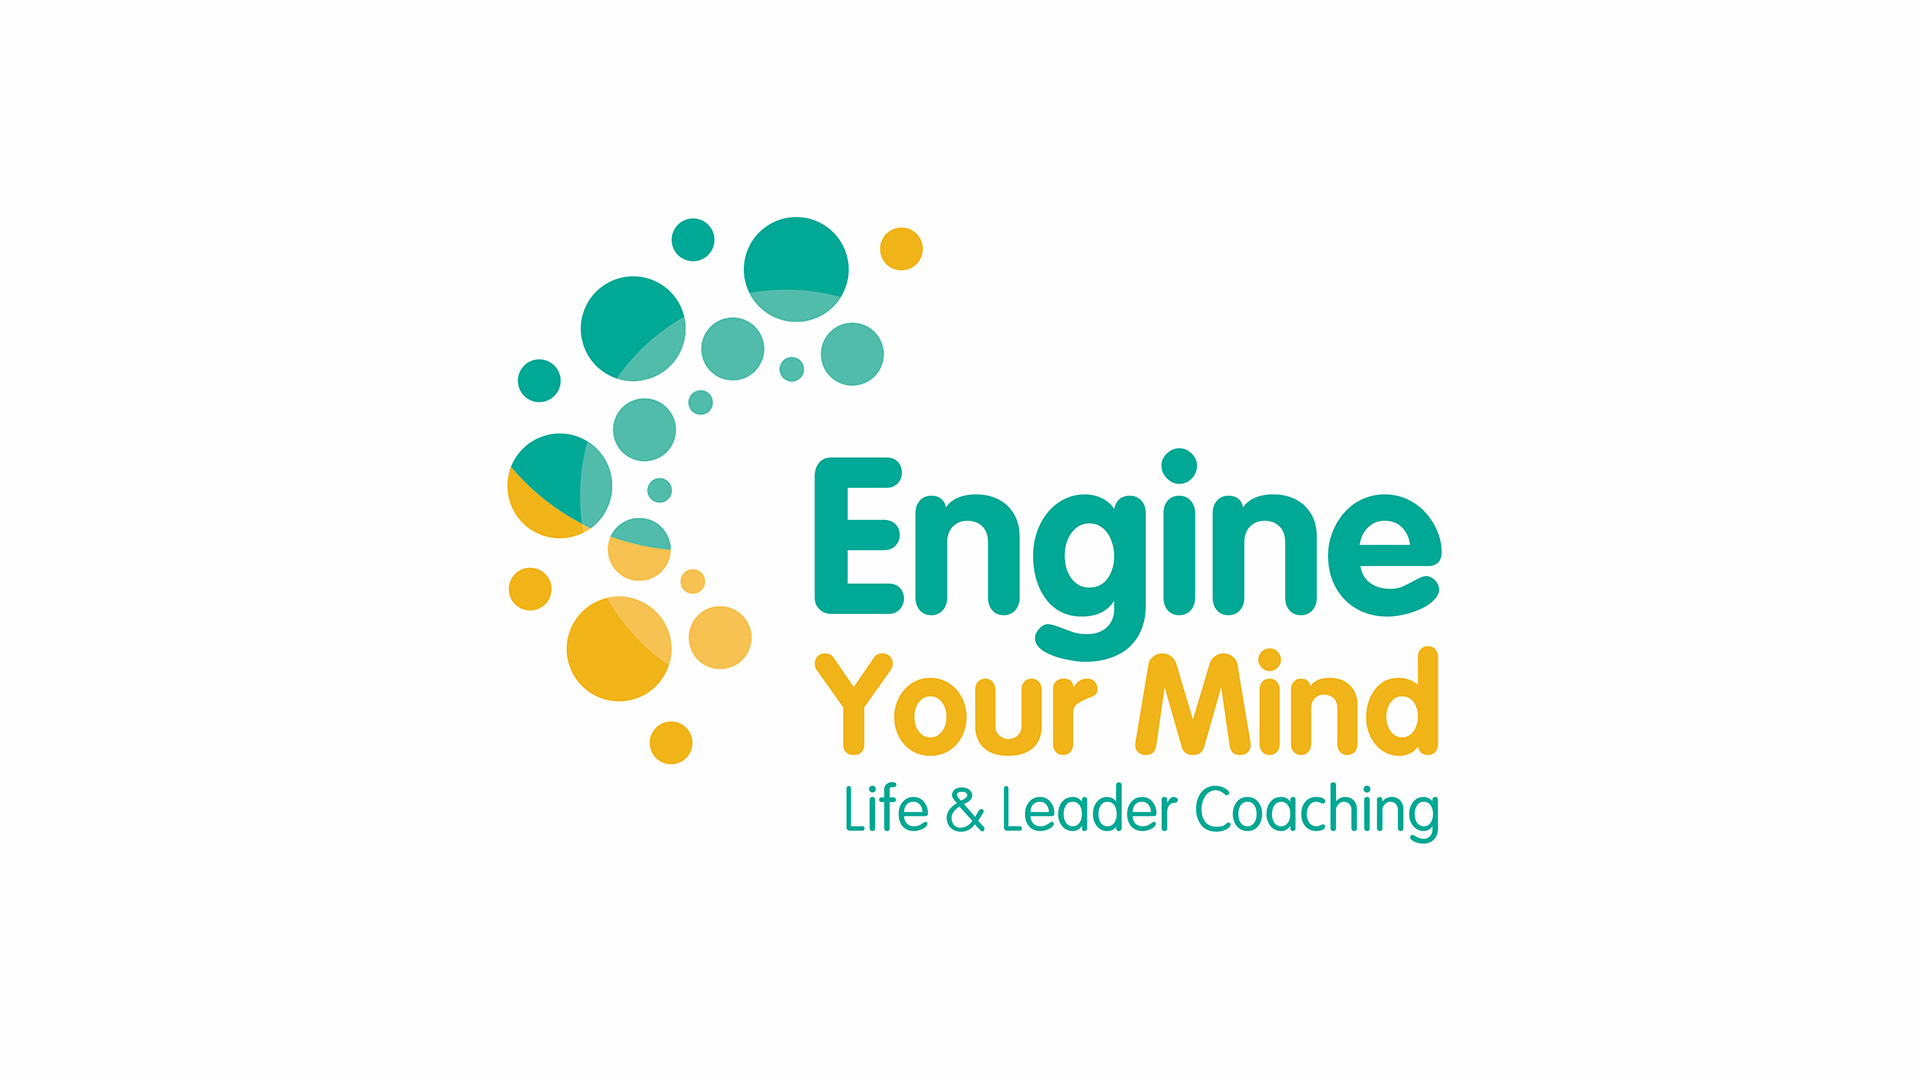 Engine Your Mind-logótipo-publicidade-design gráfico